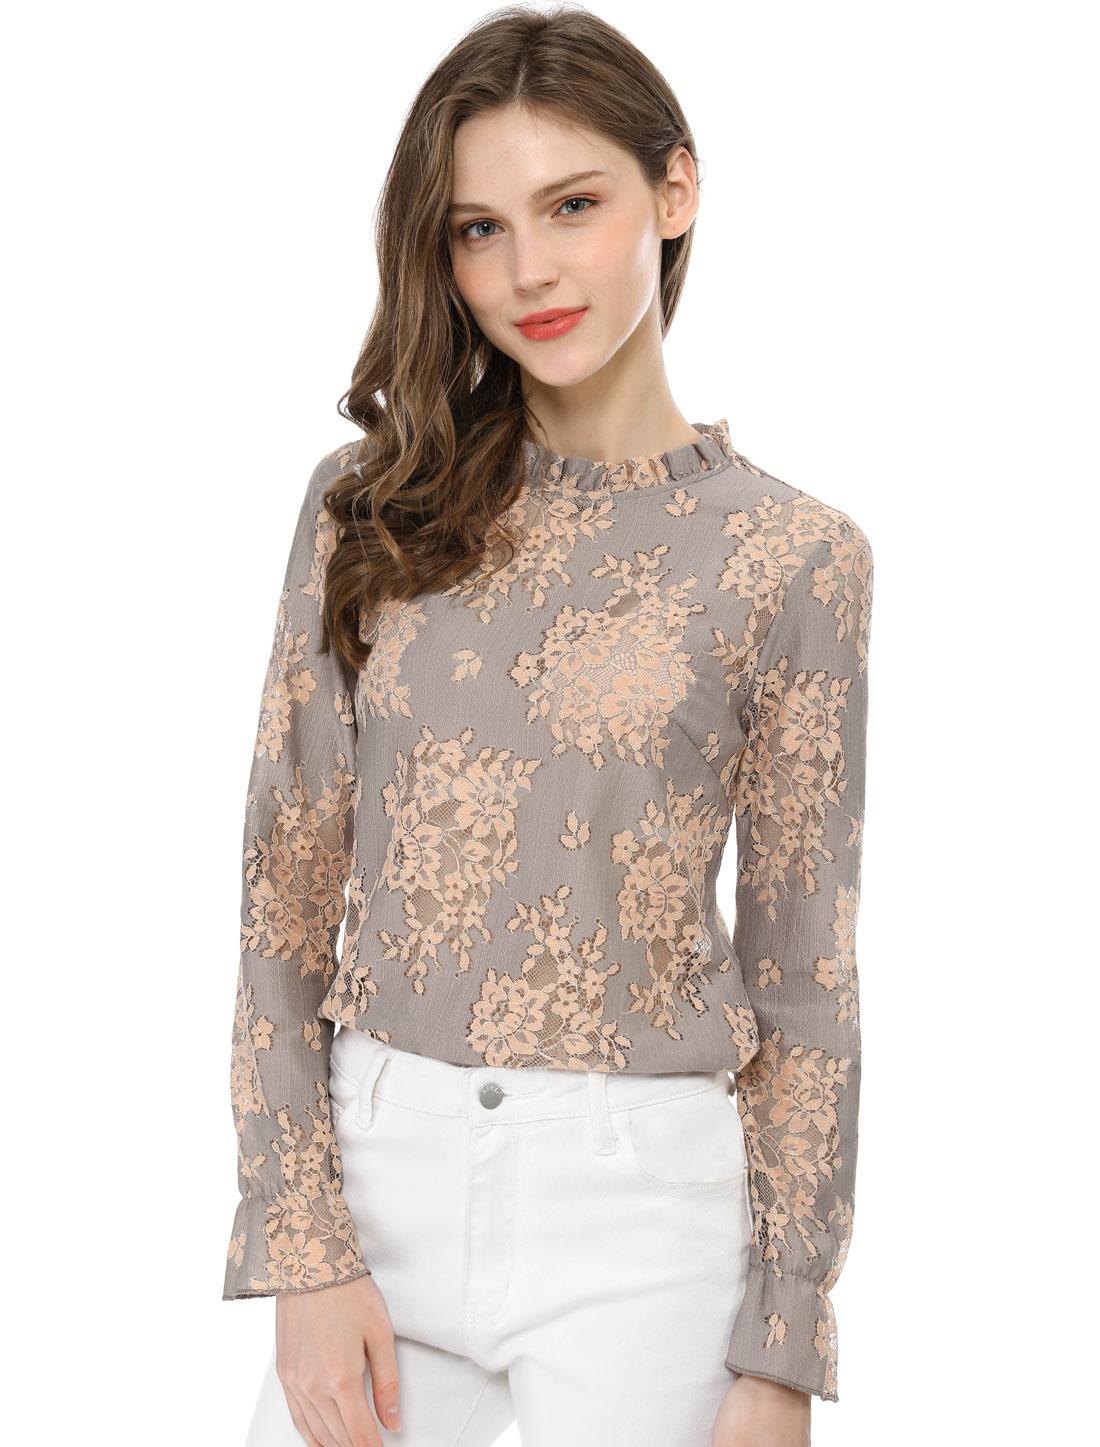 Allegra K Womens Lace Sheer Floral Color Block Blouse Purple XS (US 2)